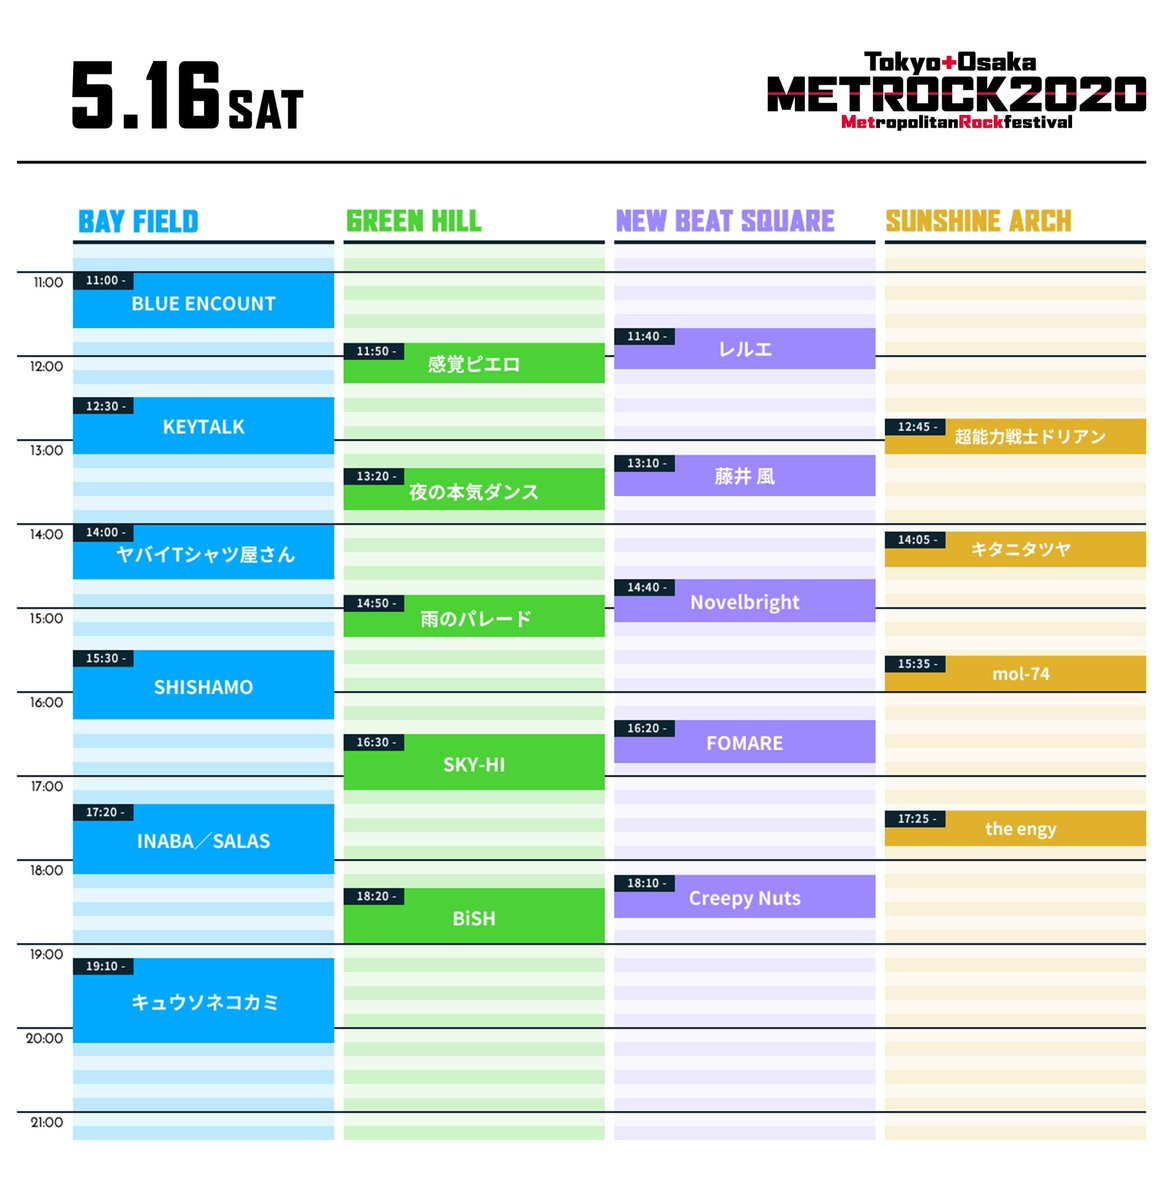 test ツイッターメディア - ✨5月16日(土)の出演アーティスト一覧✨  3月29日(日)10時より一般発売開始‼️ 詳しくは公式HPをチェック👀 https://t.co/EU2DobFgD3  #メトロック #METROCK #春フェス #大阪 #東京 https://t.co/7JYGiOU7kU